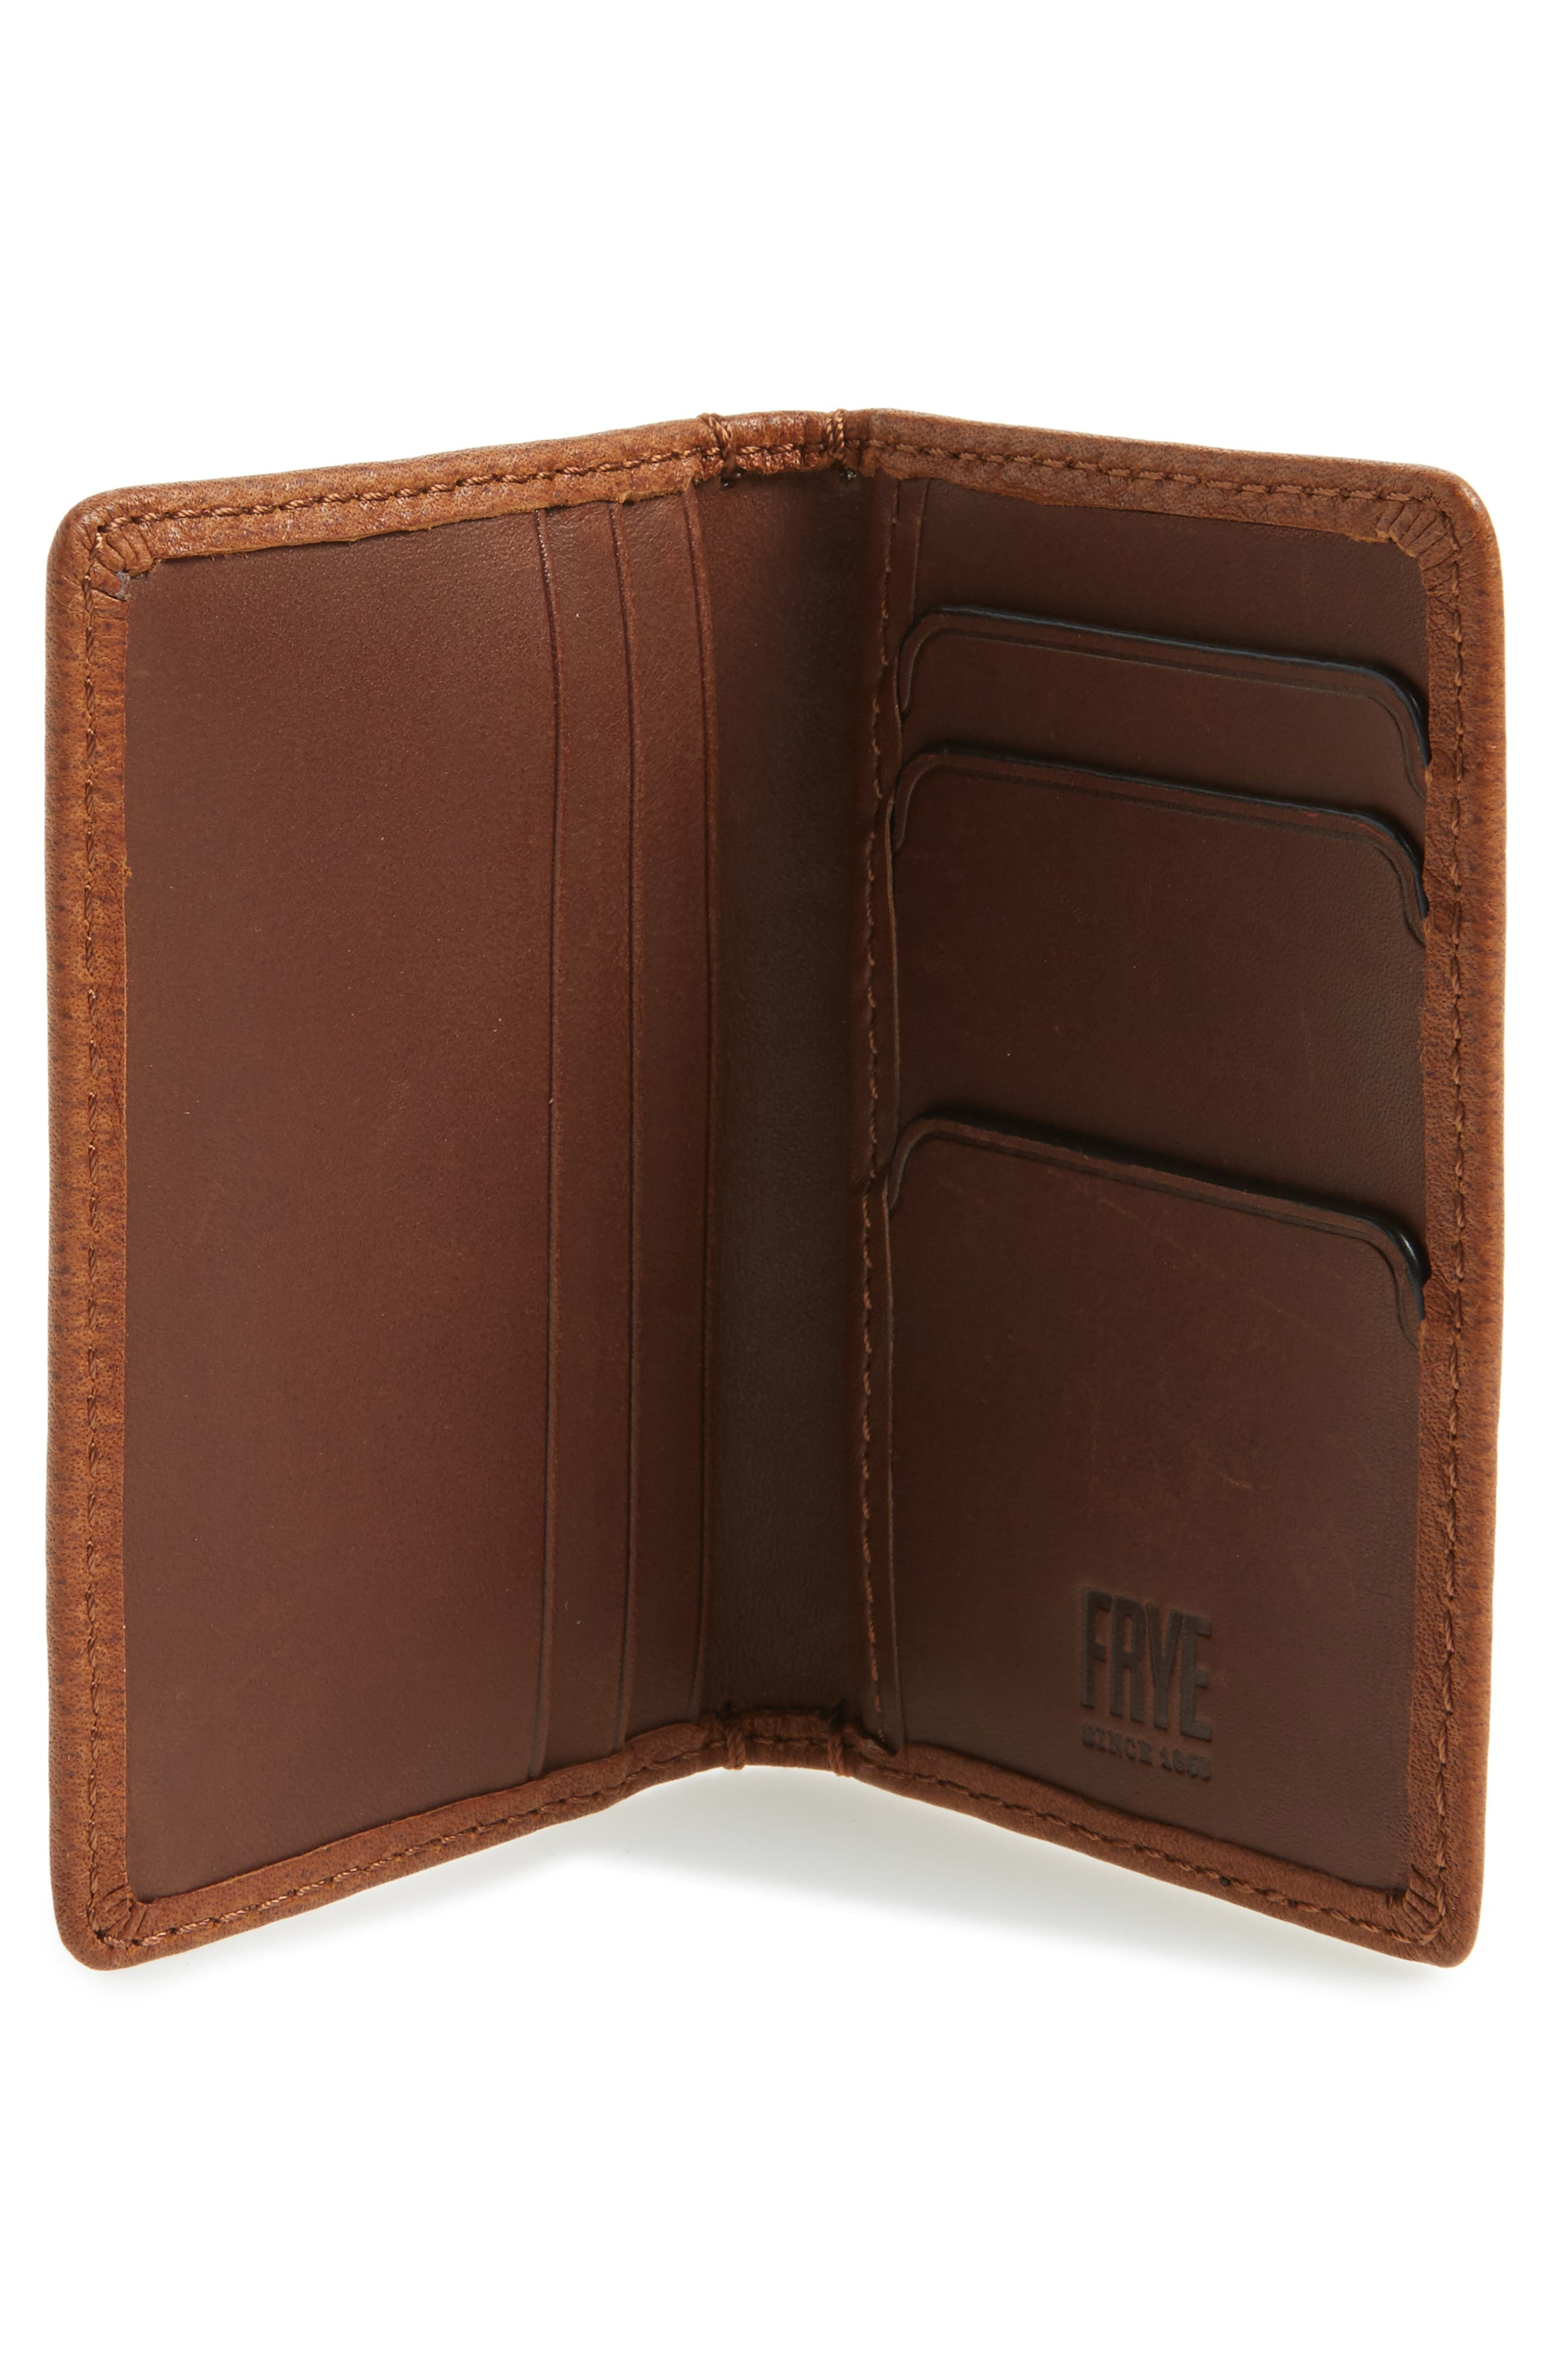 Oliver Leather Wallet,                             Alternate thumbnail 2, color,                             Cognac